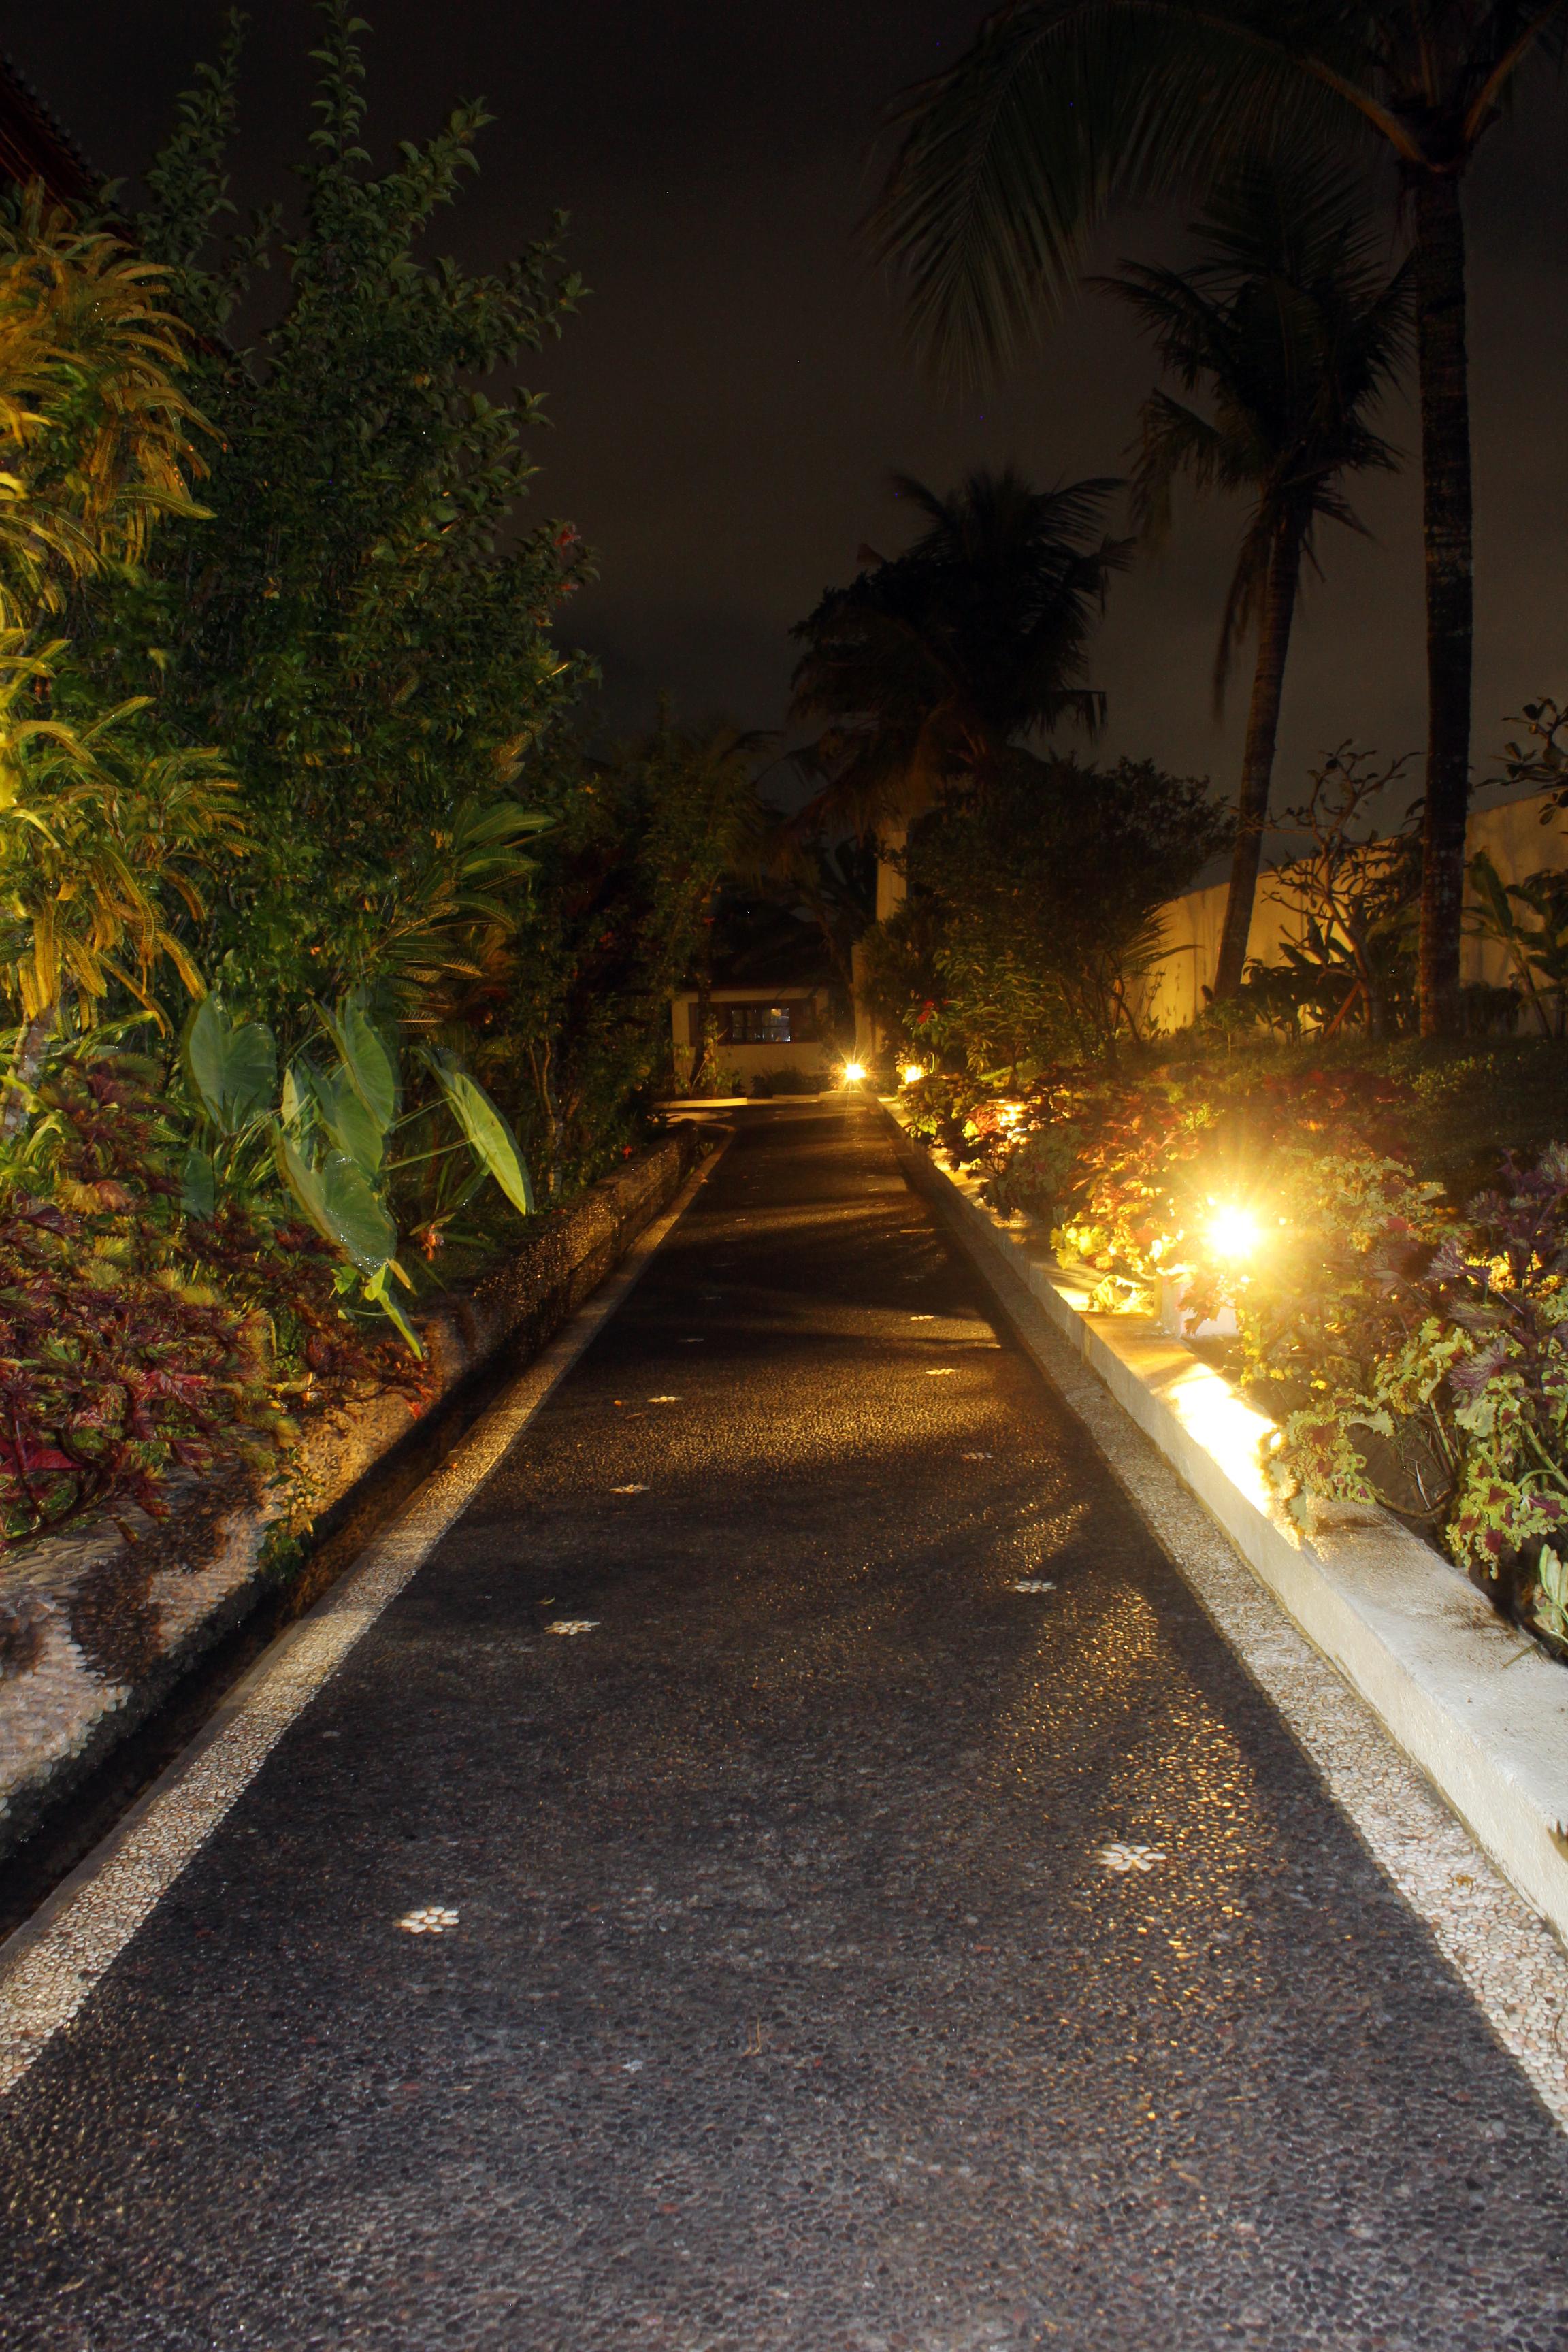 Well lit pathways